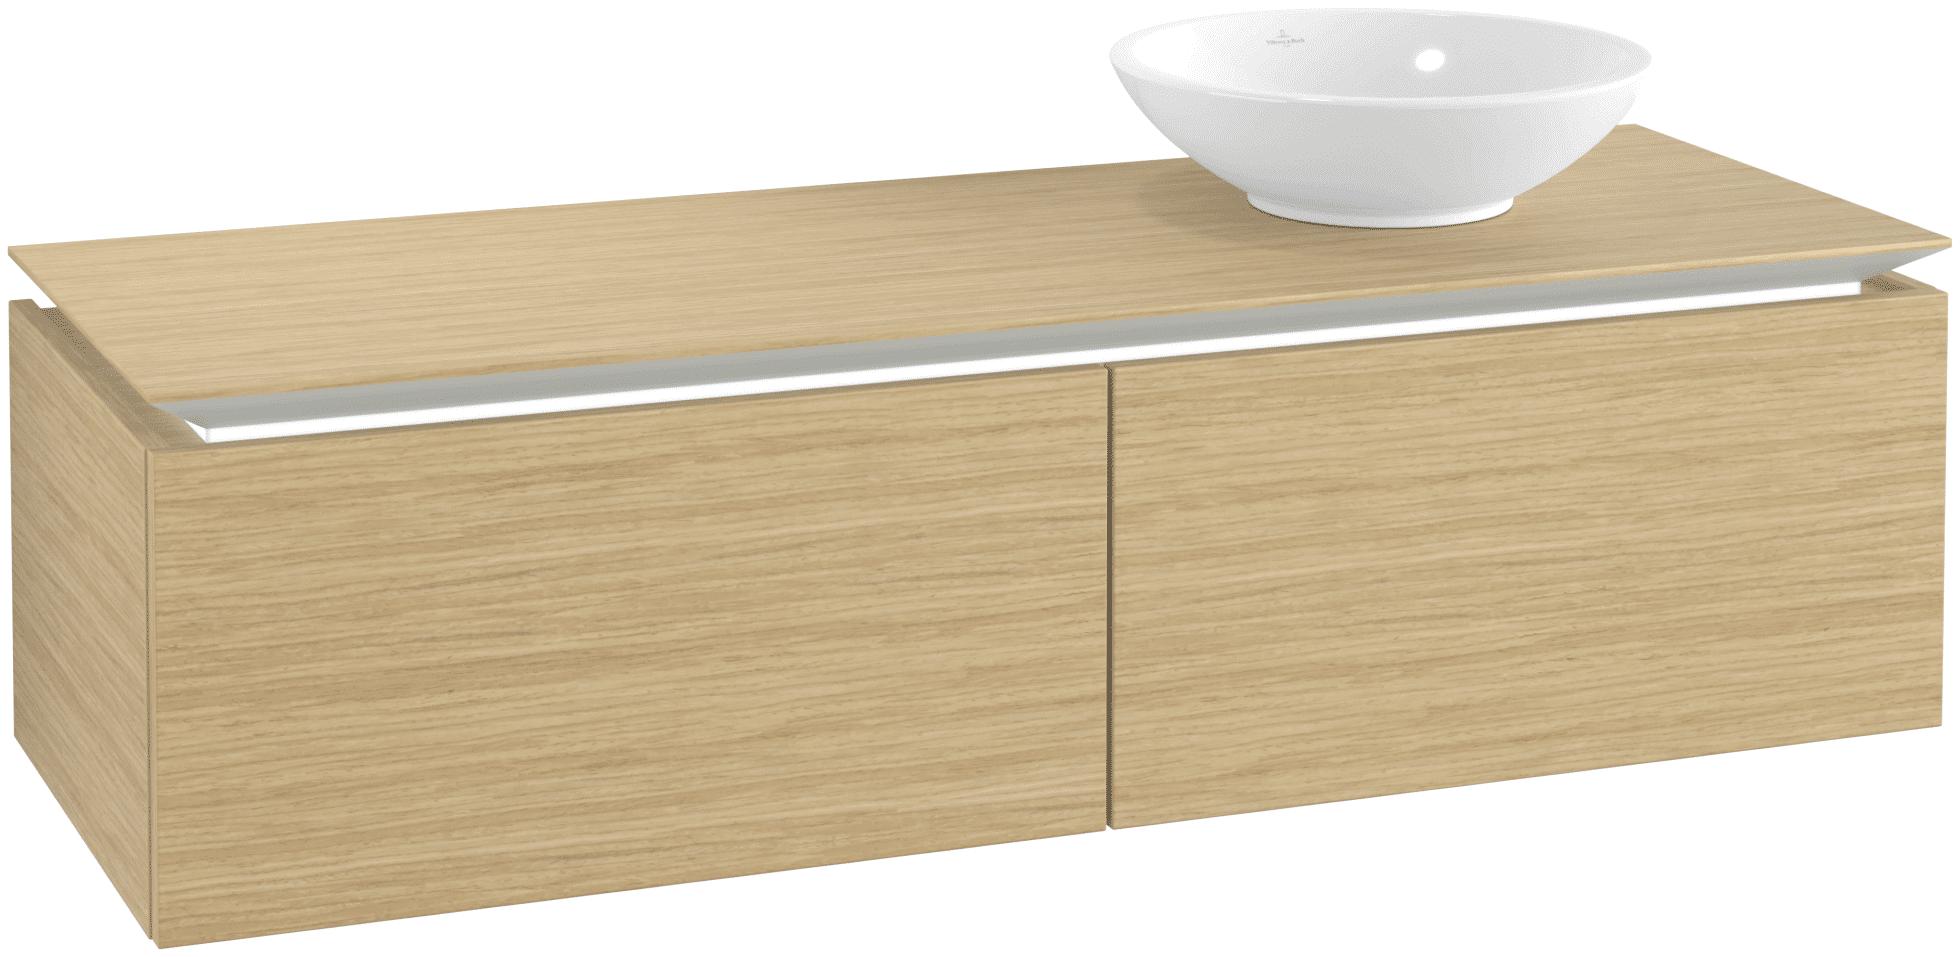 Villeroy & Boch Villeroy & Boch Legato - Meuble sous lavabo with 2 drawers & 1 cut-out right 1400 x 380 x 500mm nordic oak